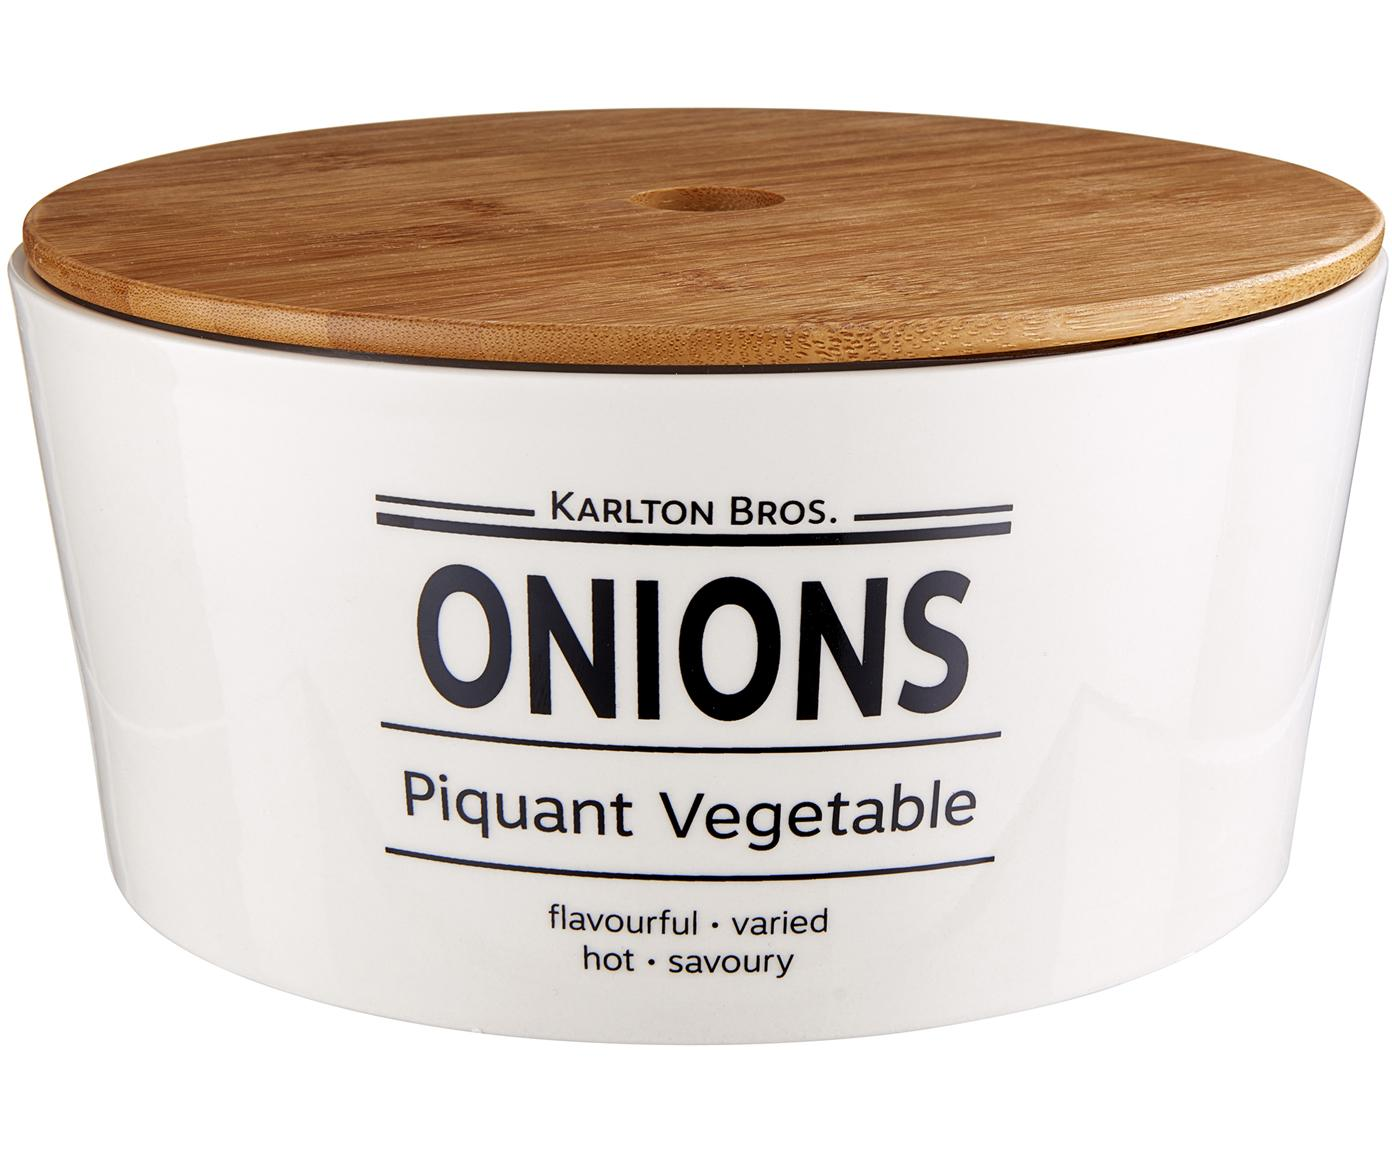 Opbergpot Karlton Bros. Onions, Porselein, Wit, zwart, bruin, Ø 22 cm